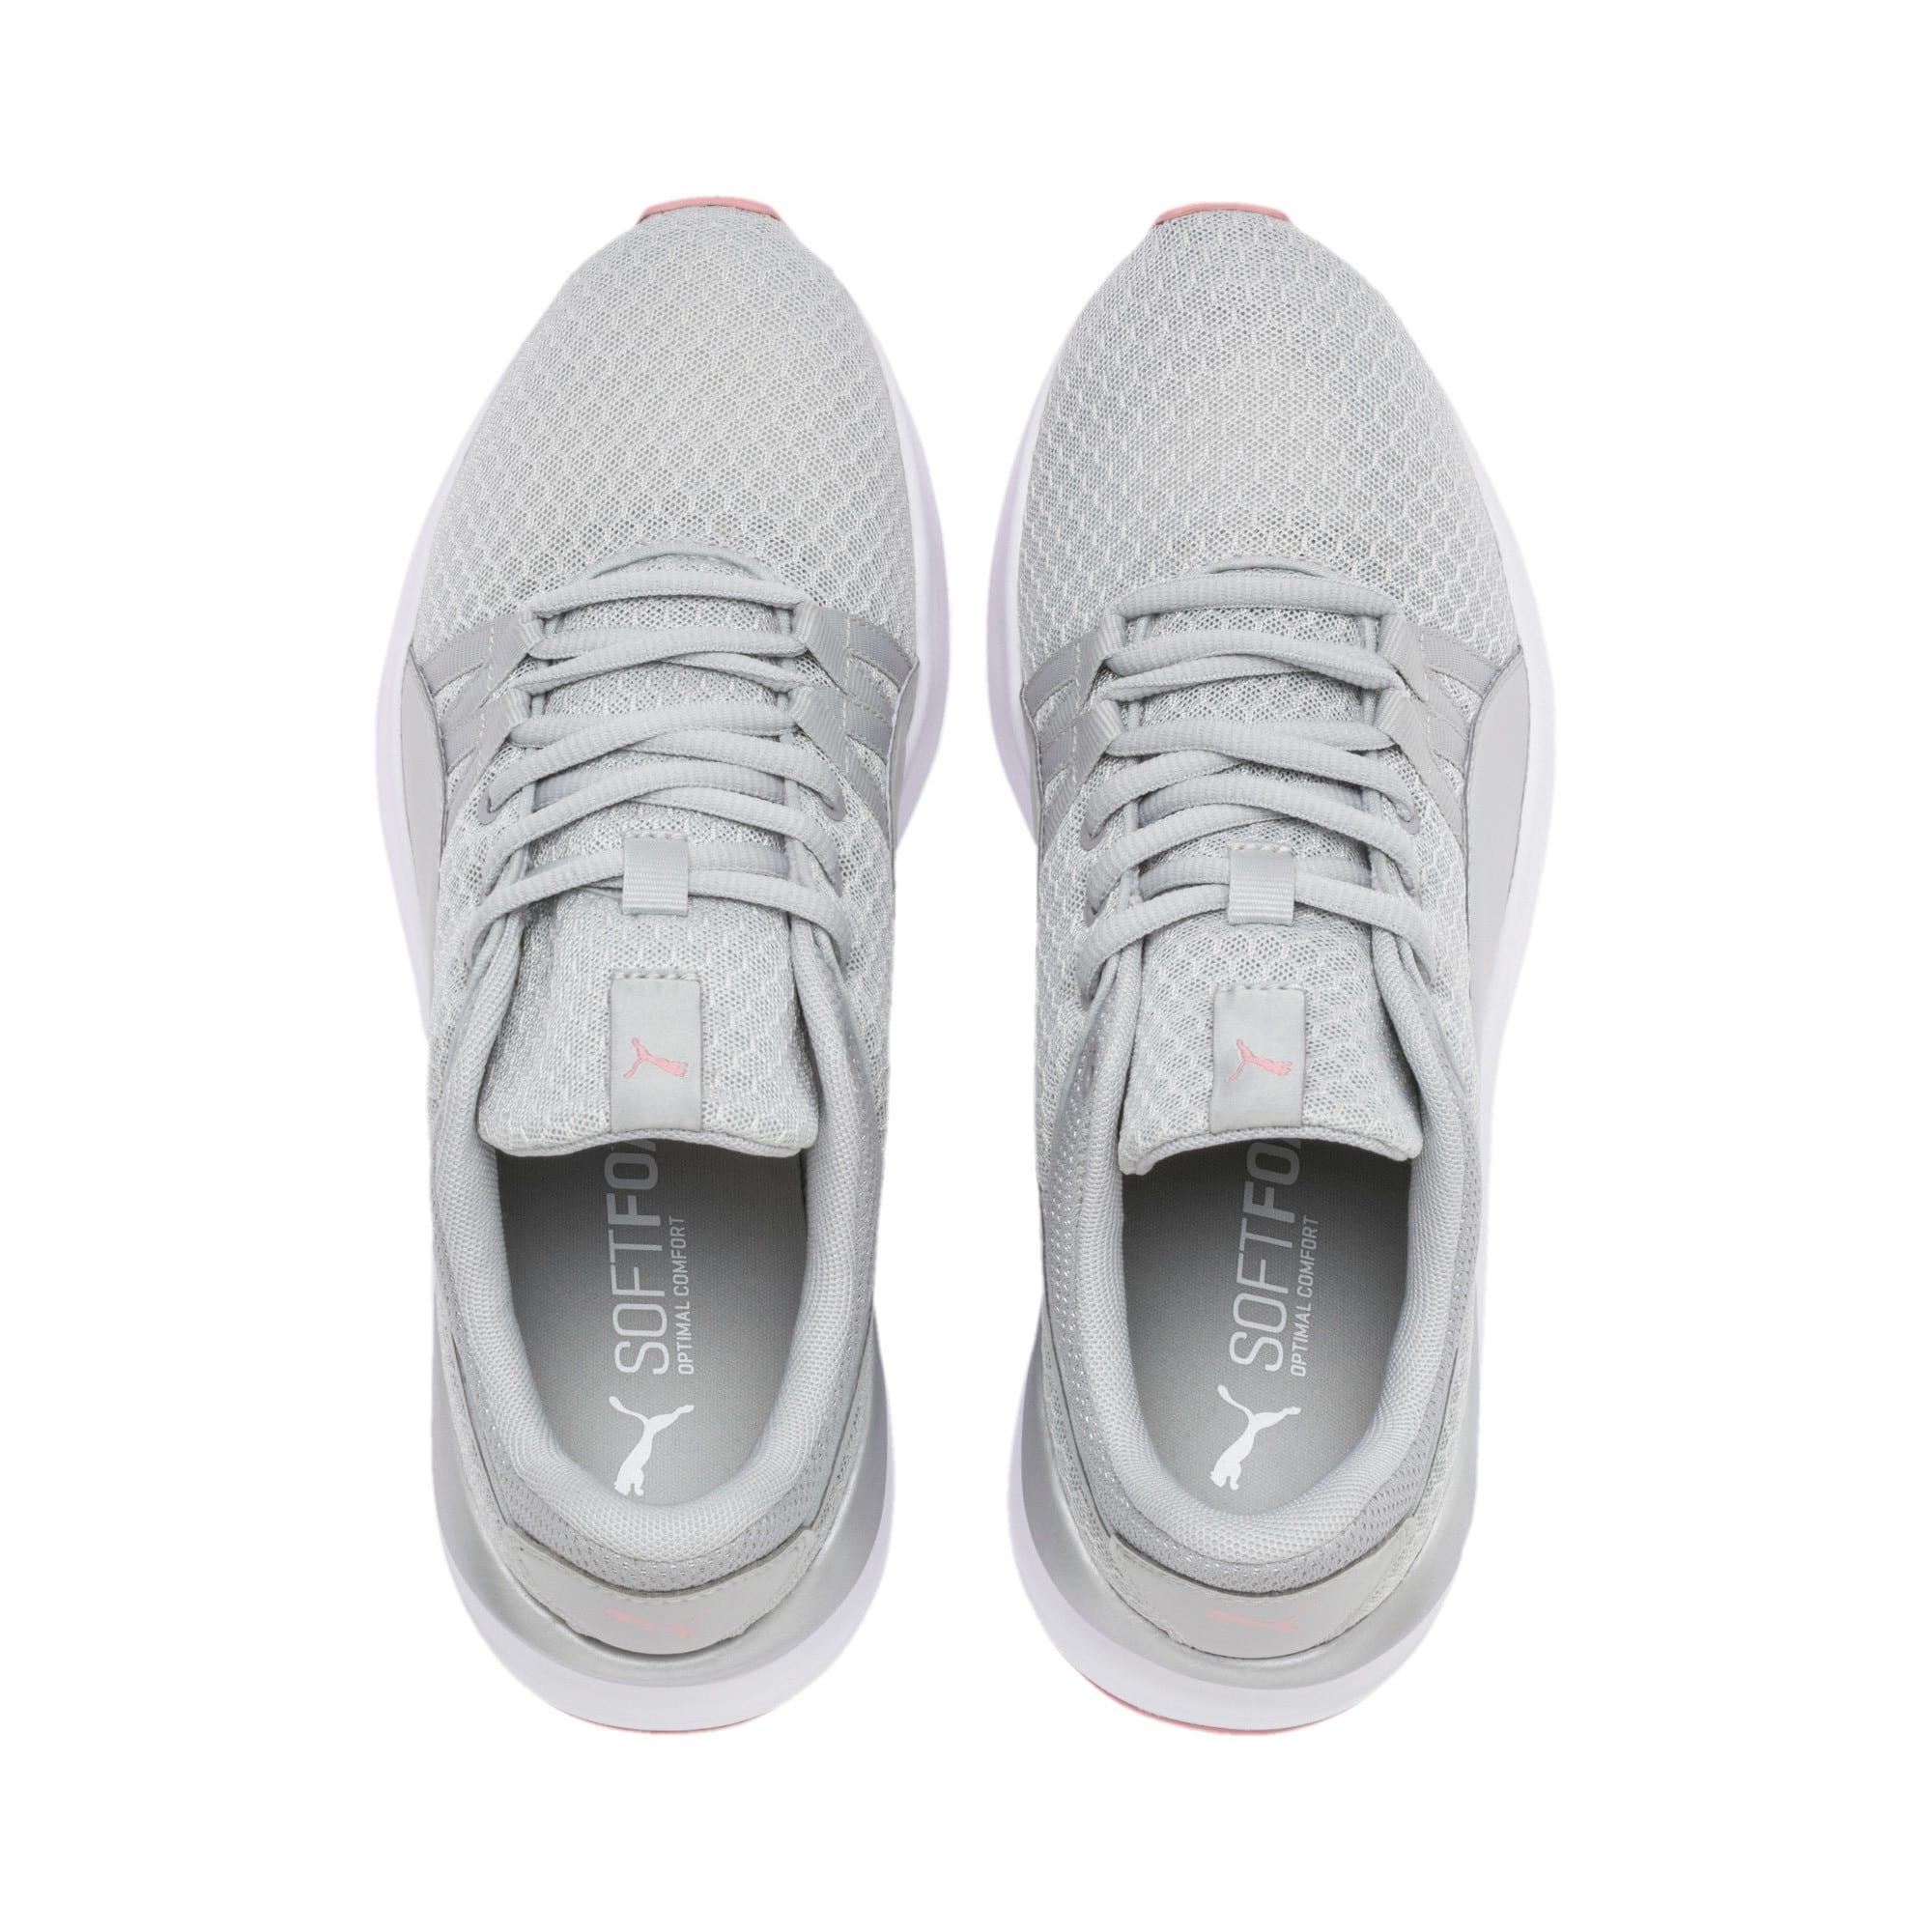 Thumbnail 7 of Adela Core Women's Sneakers, Gray Violet-Puma Silver, medium